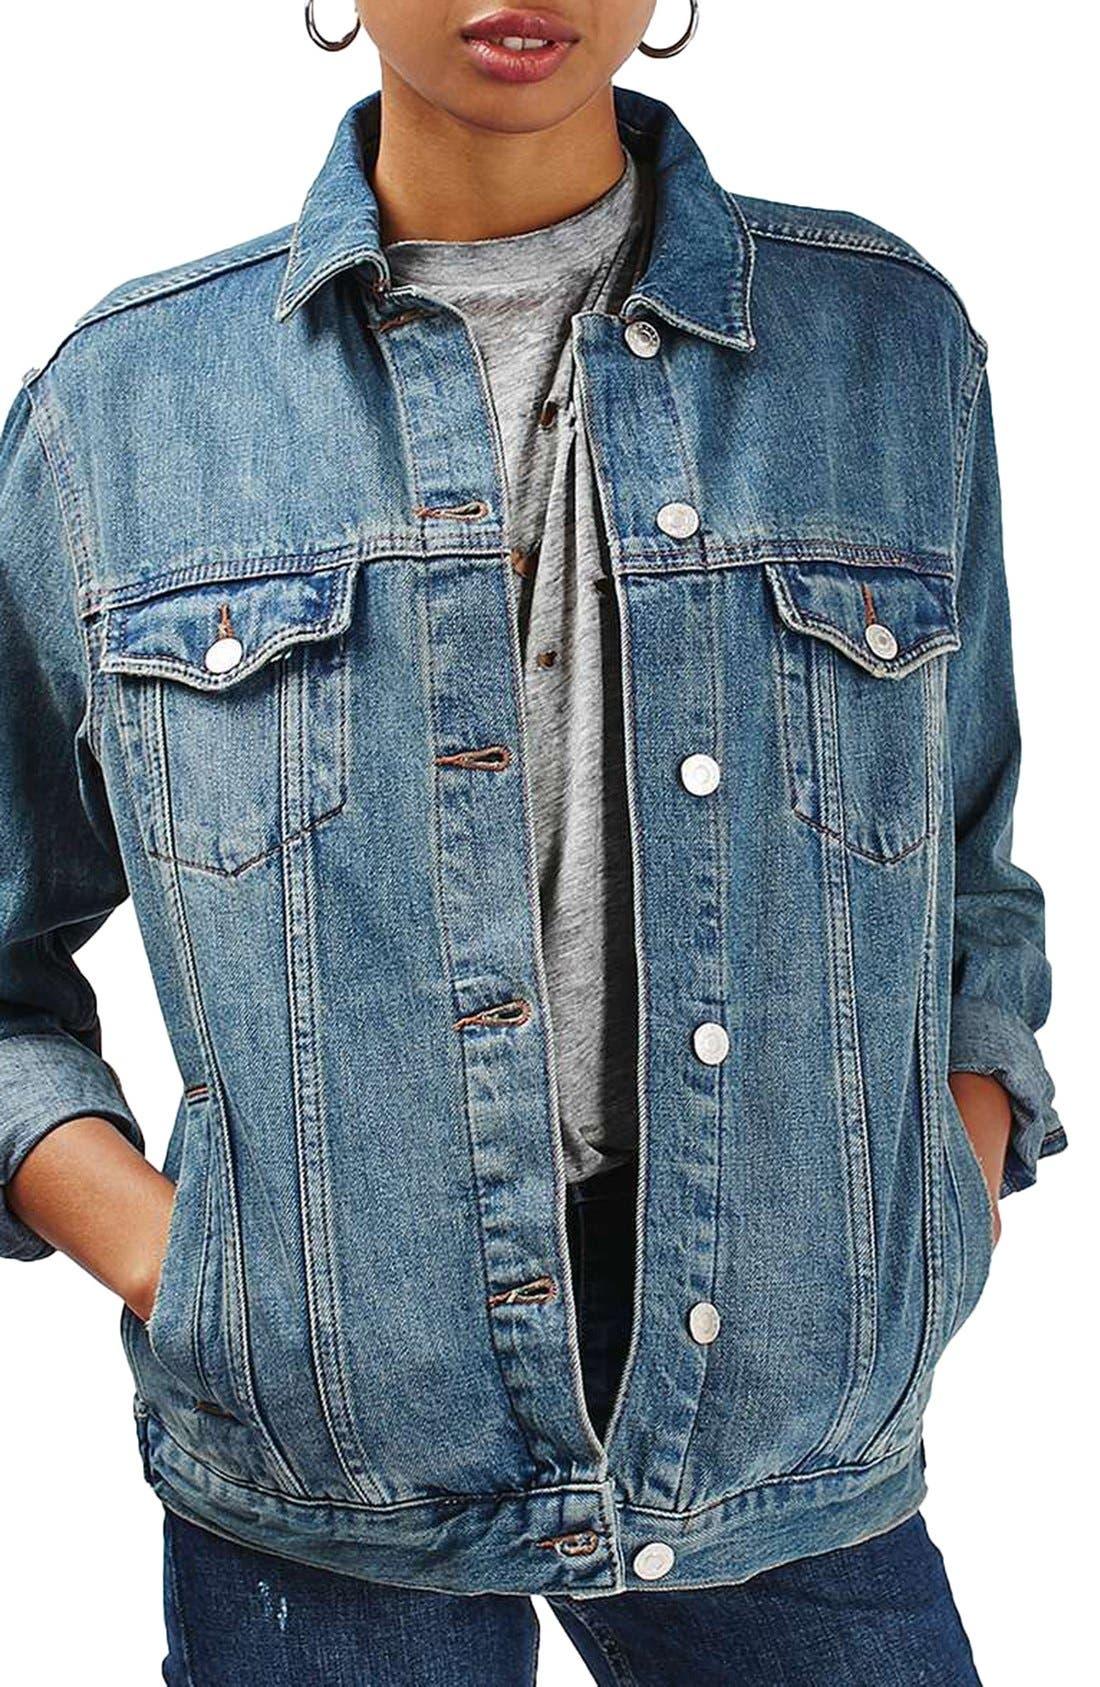 Alternate Image 1 Selected - Topshop Moto Western Denim Jacket